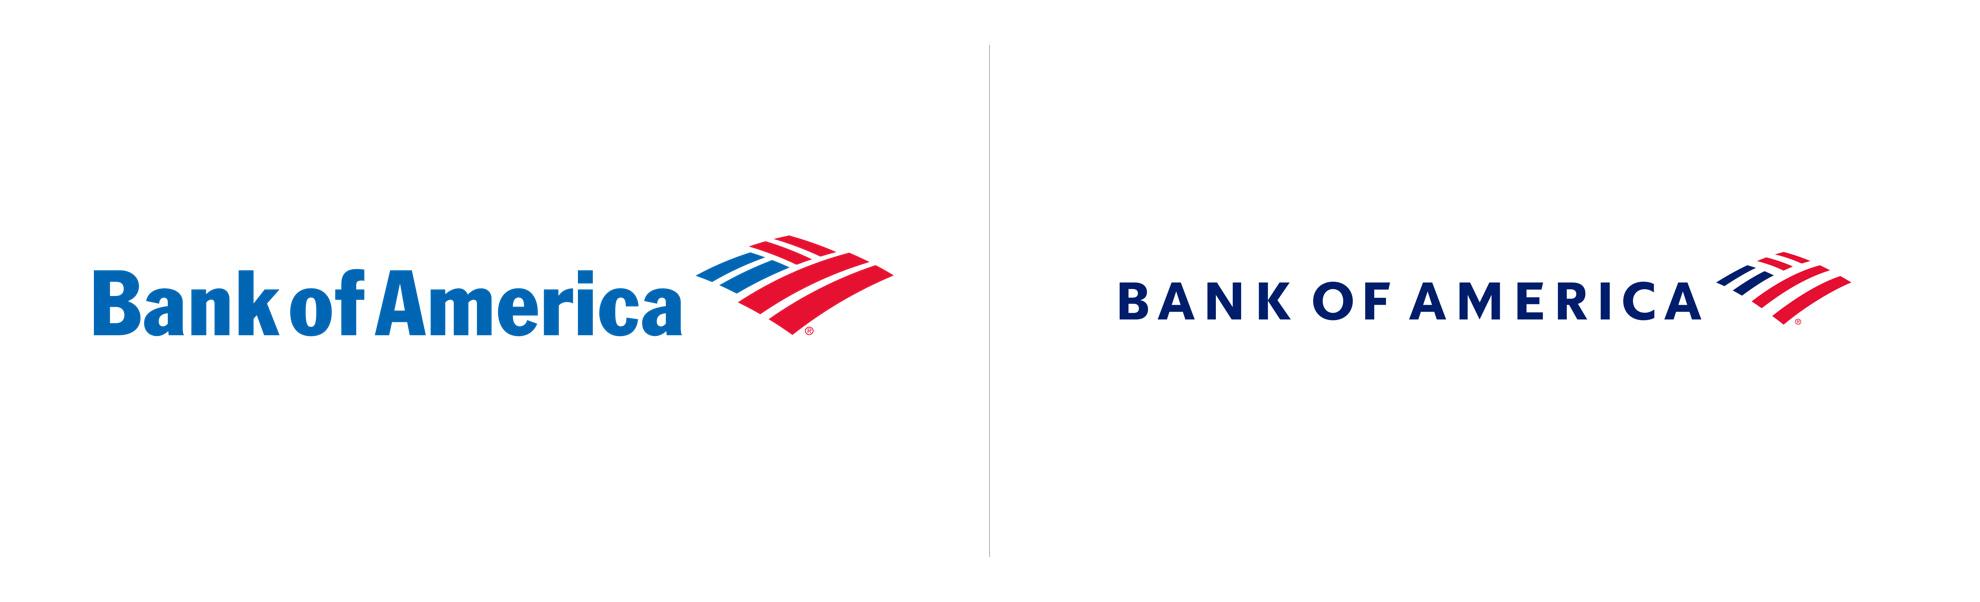 nowe istare logo bank of america